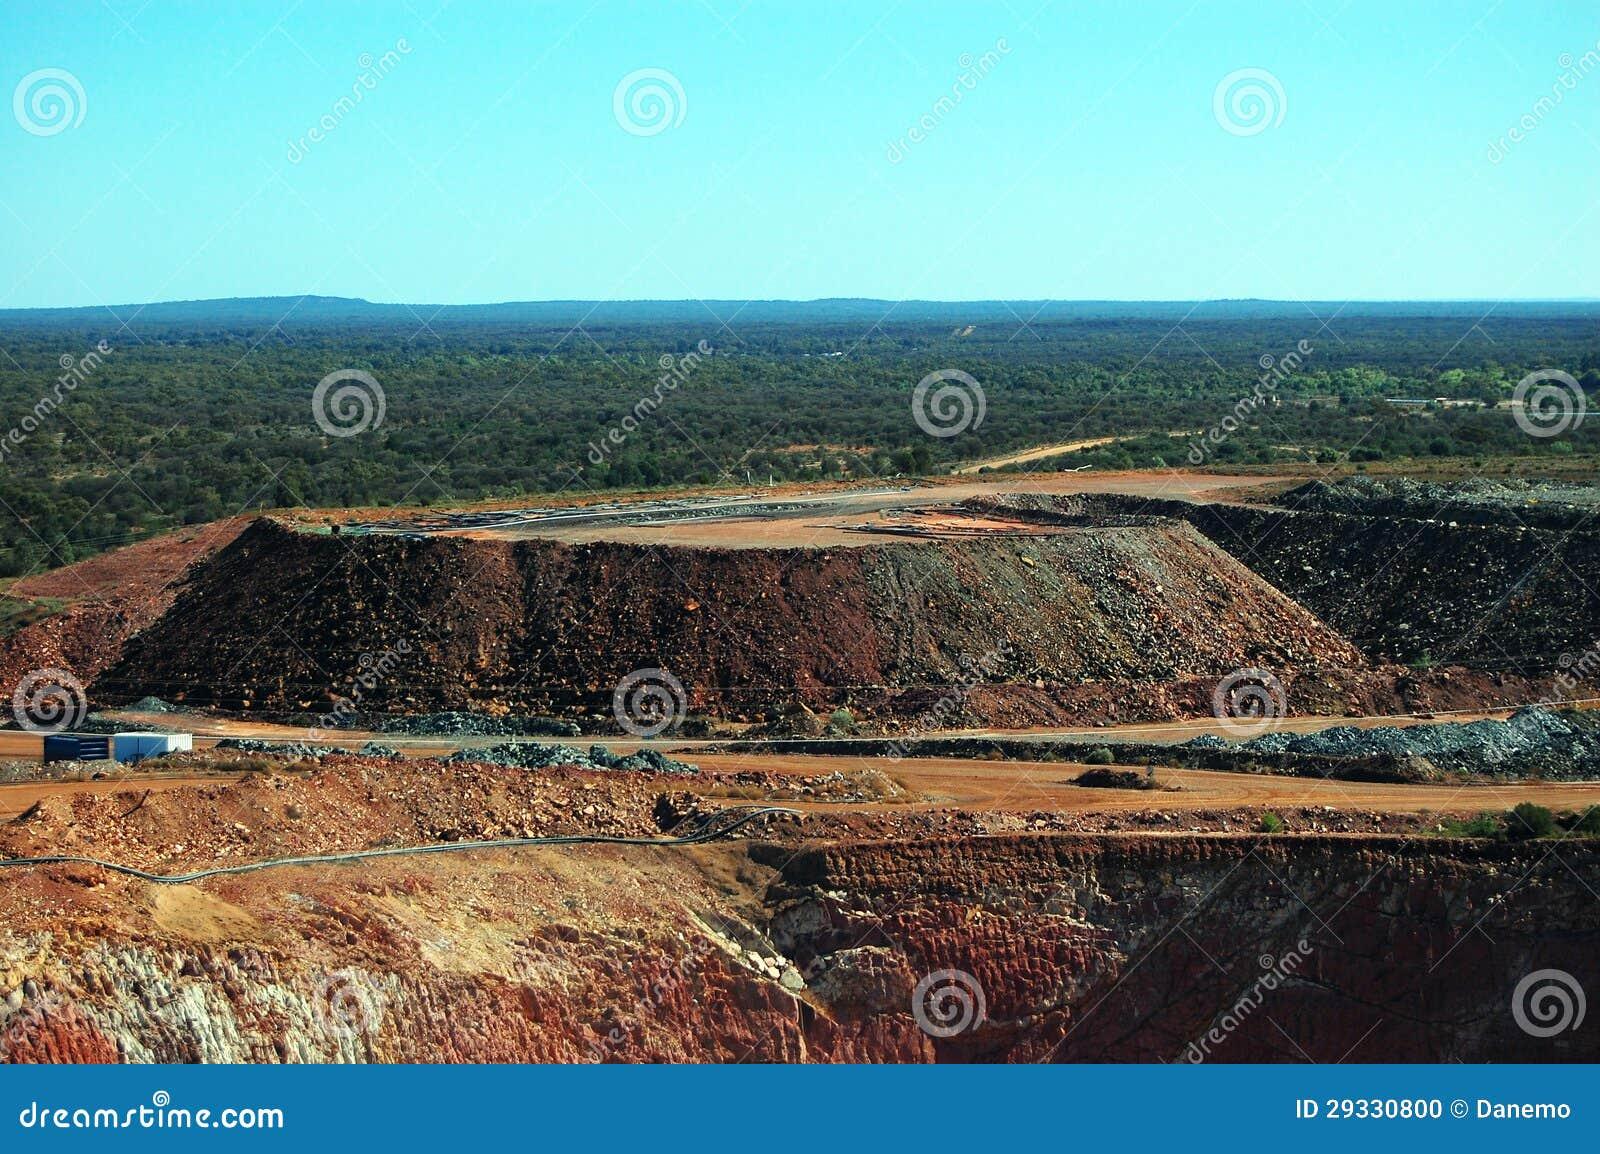 Gold mine open pit